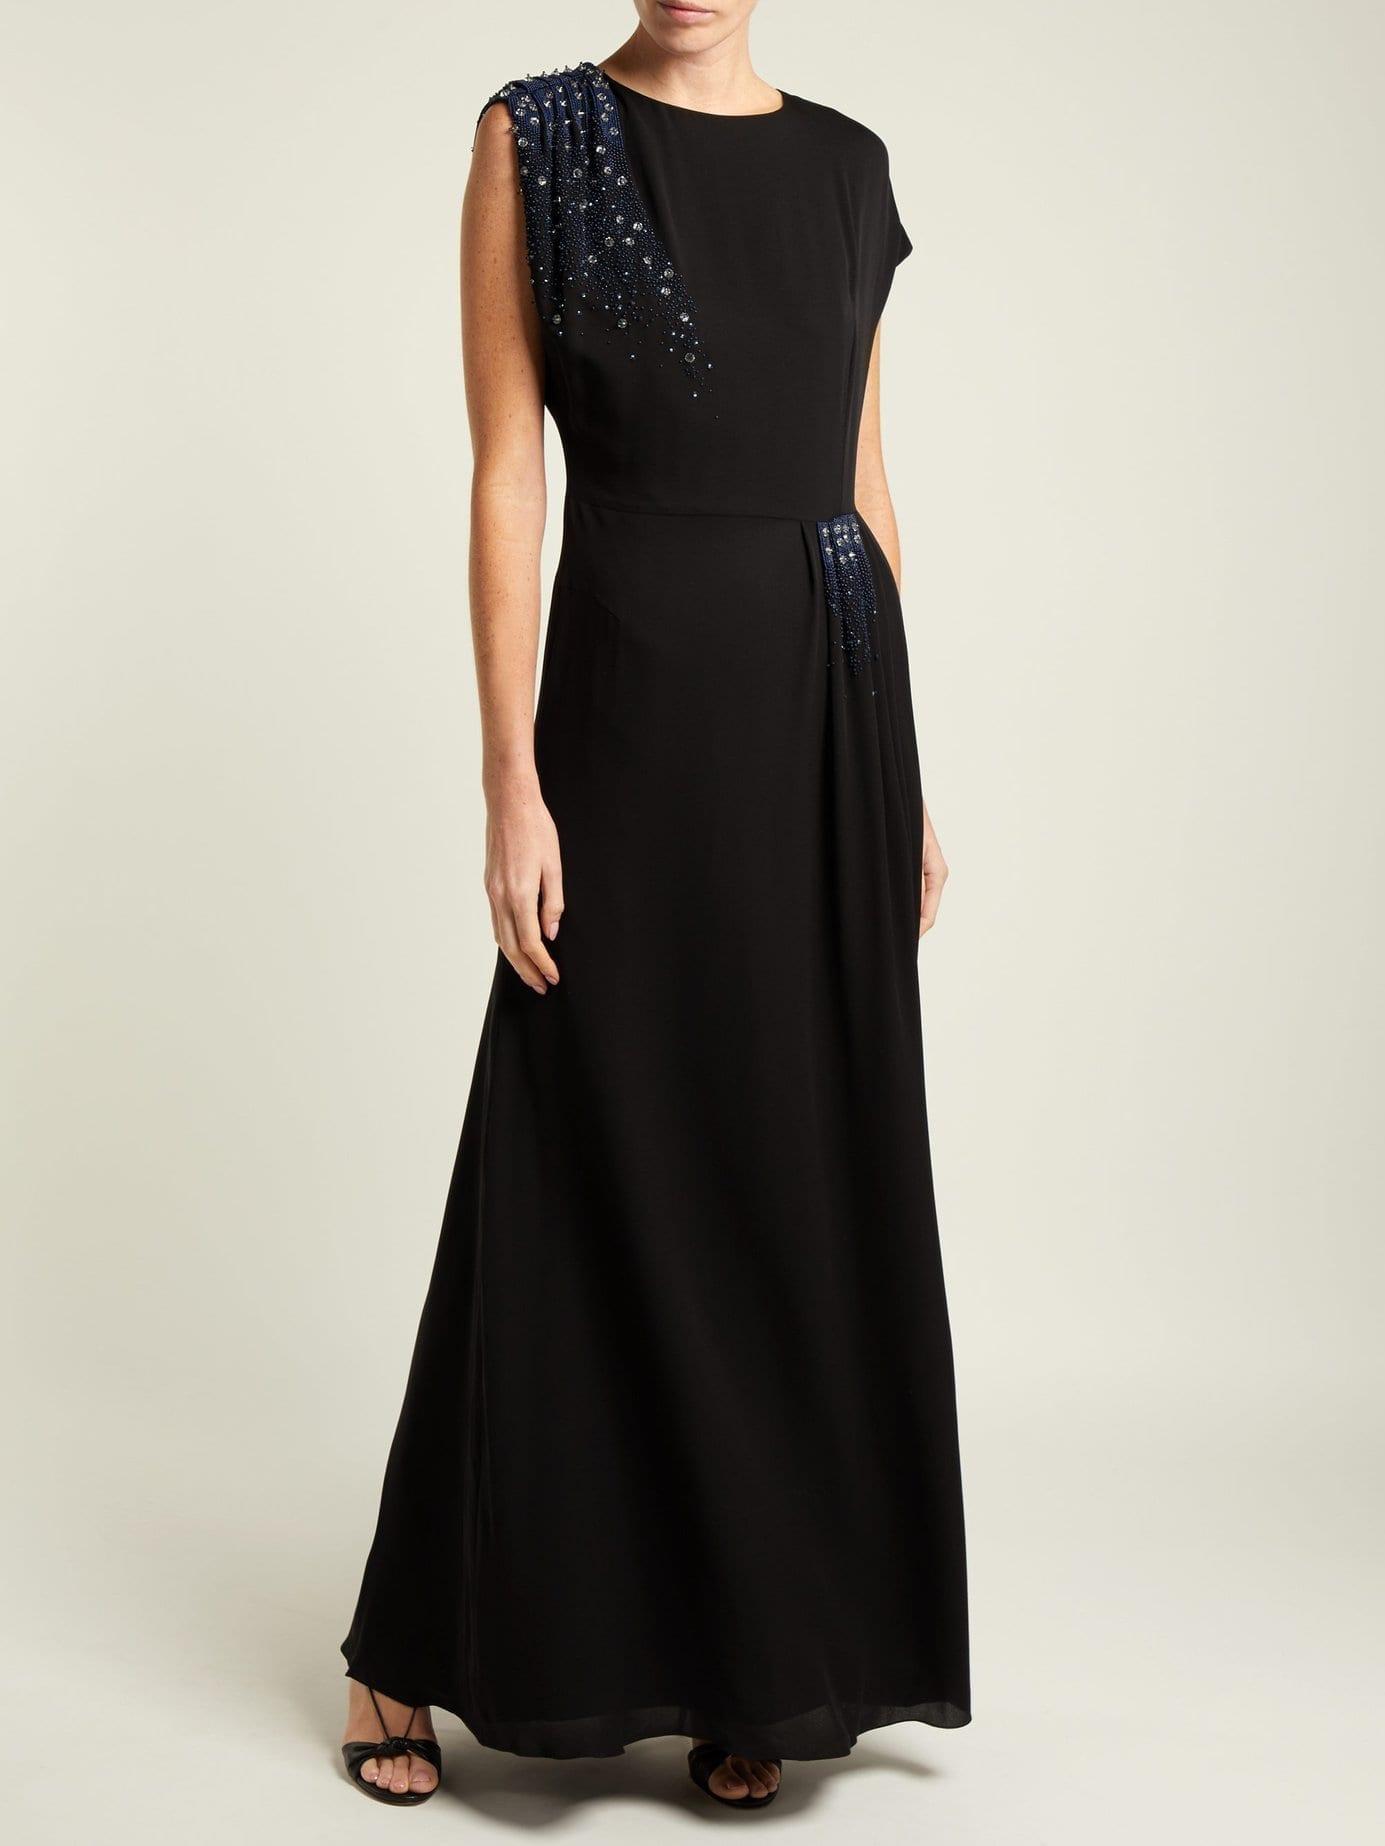 LANVIN Beaded Silk Georgette Black Gown